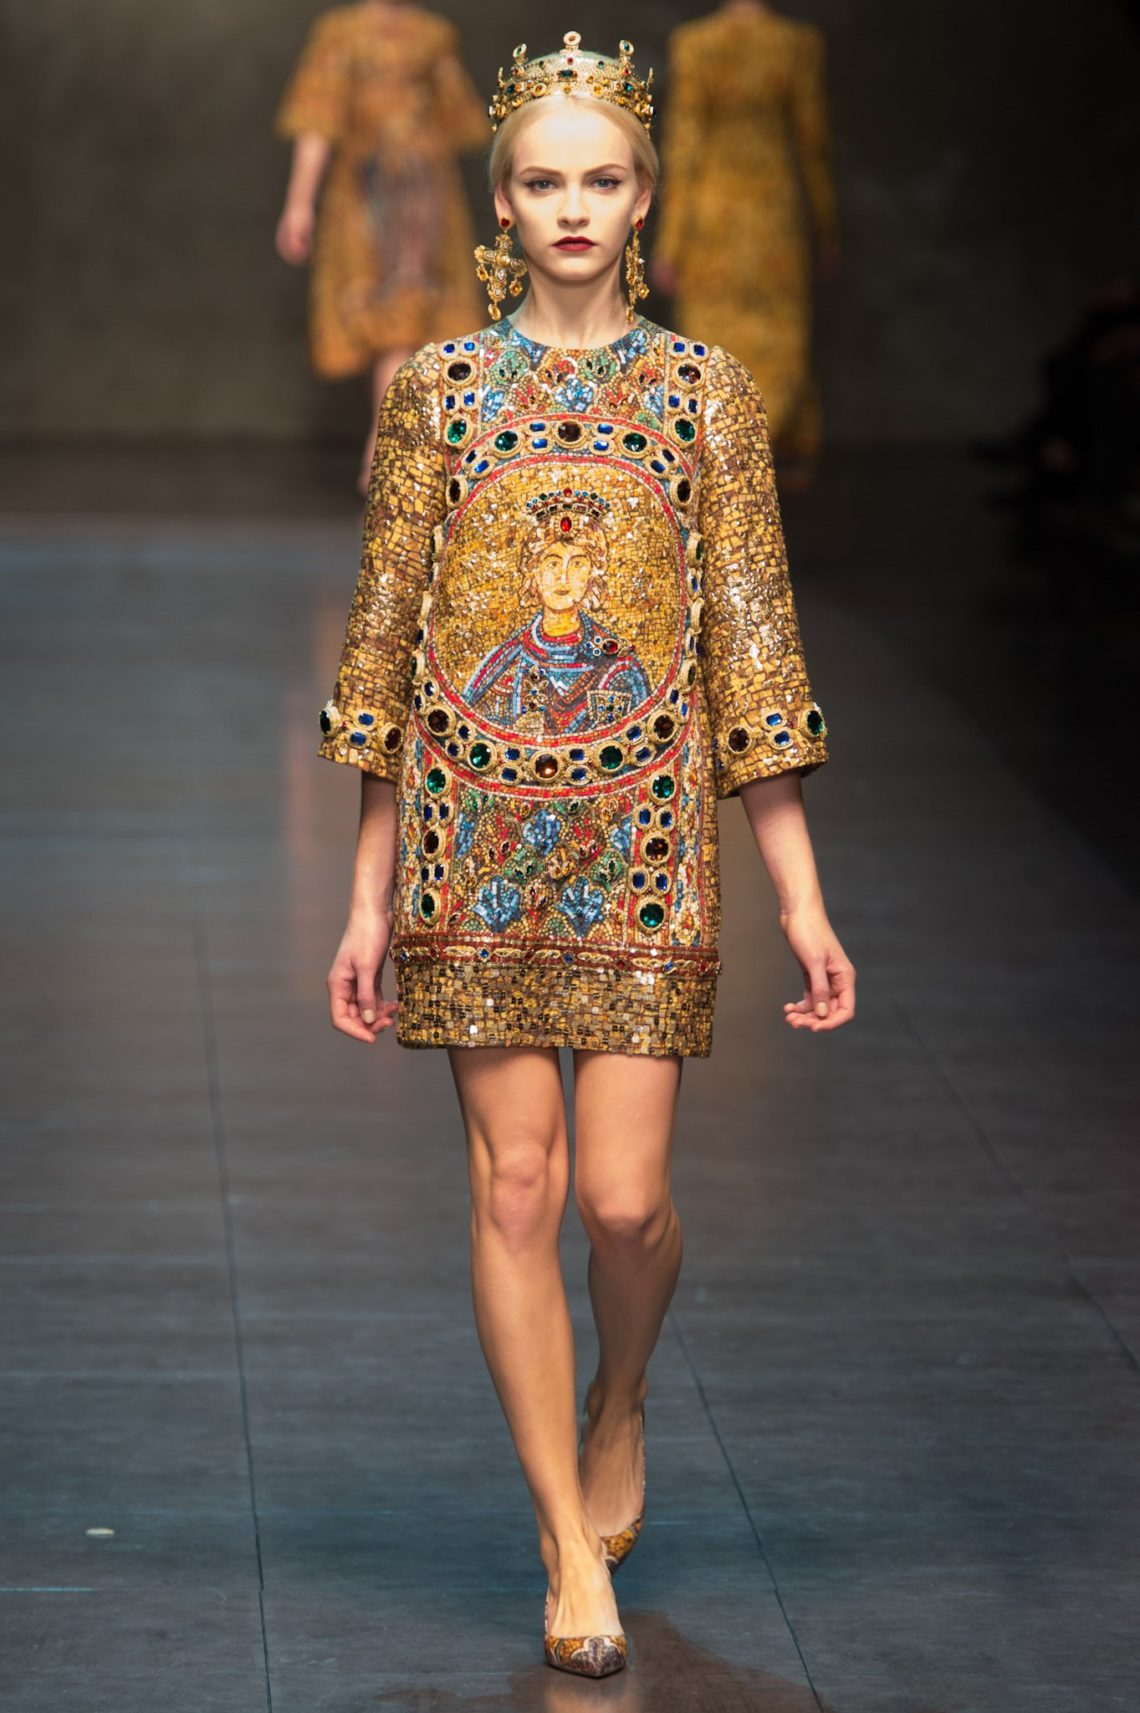 Unveiling-Intriguing-Conversation_Fashion-Religion-at-Met-Costume-Institute_Dolce-Gabbana_Byzantine-mosaics-dress